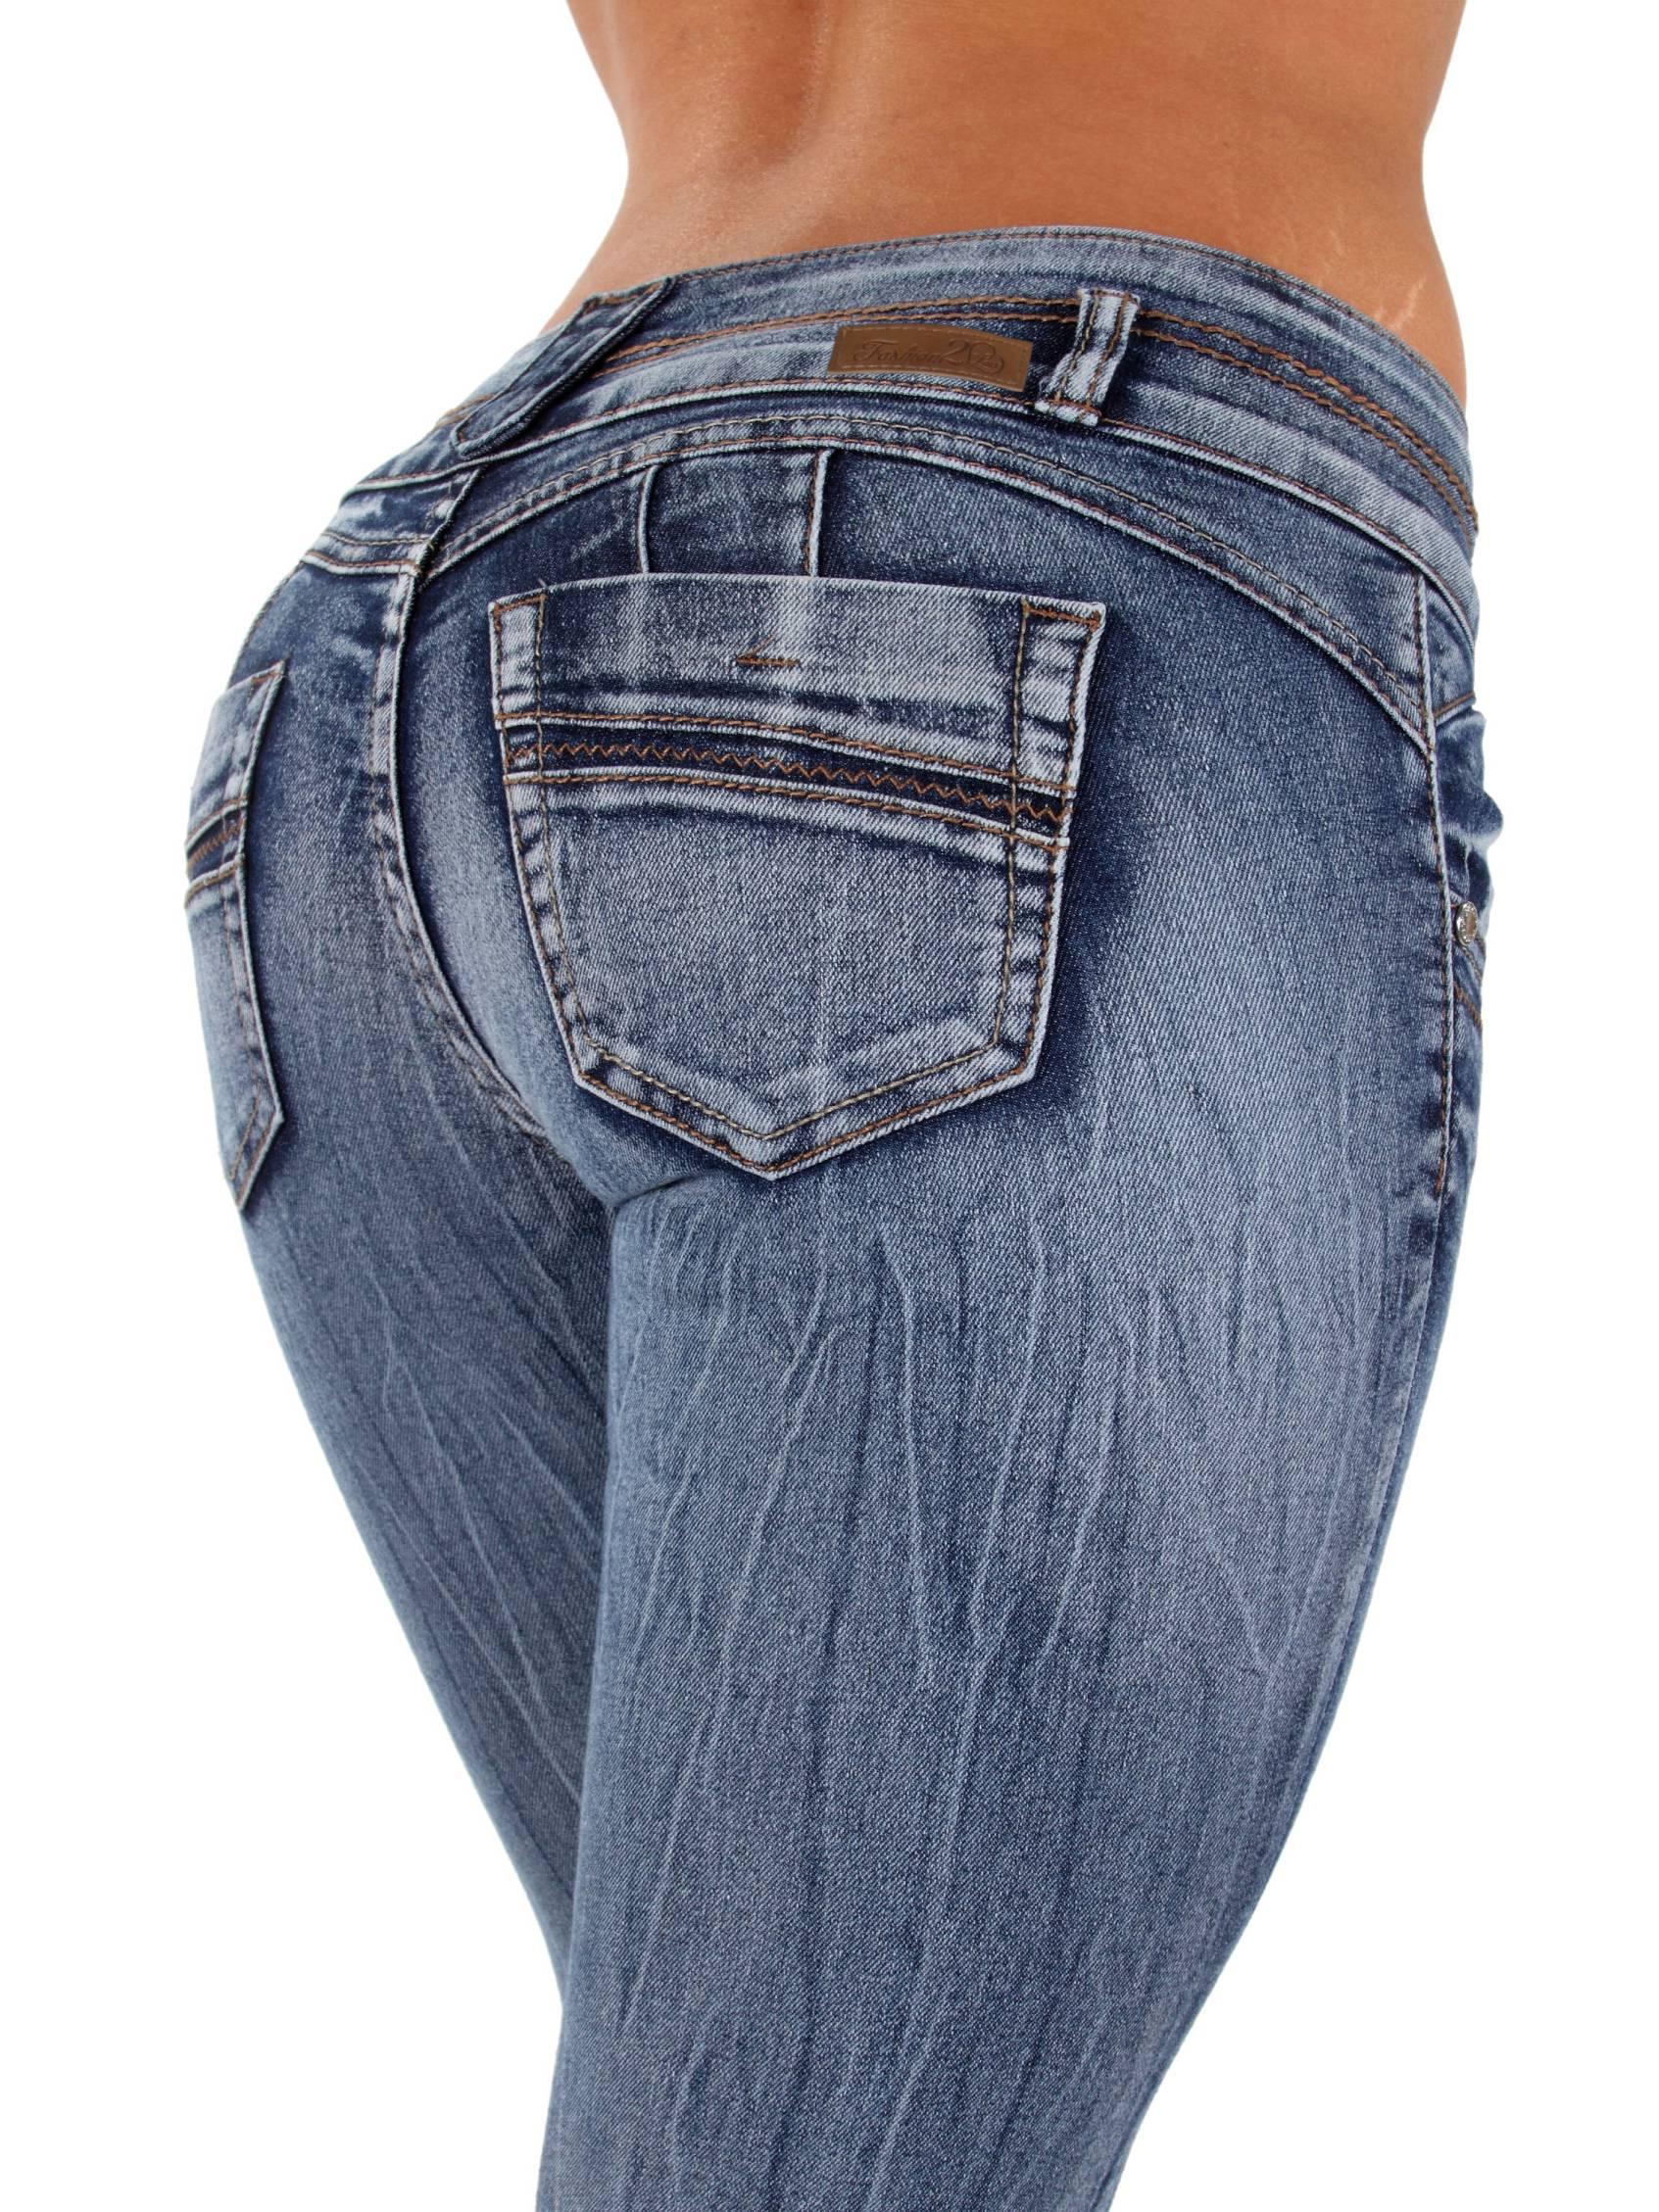 Colombian Design, Butt Lift, Levanta Cola, Skinny Jeans